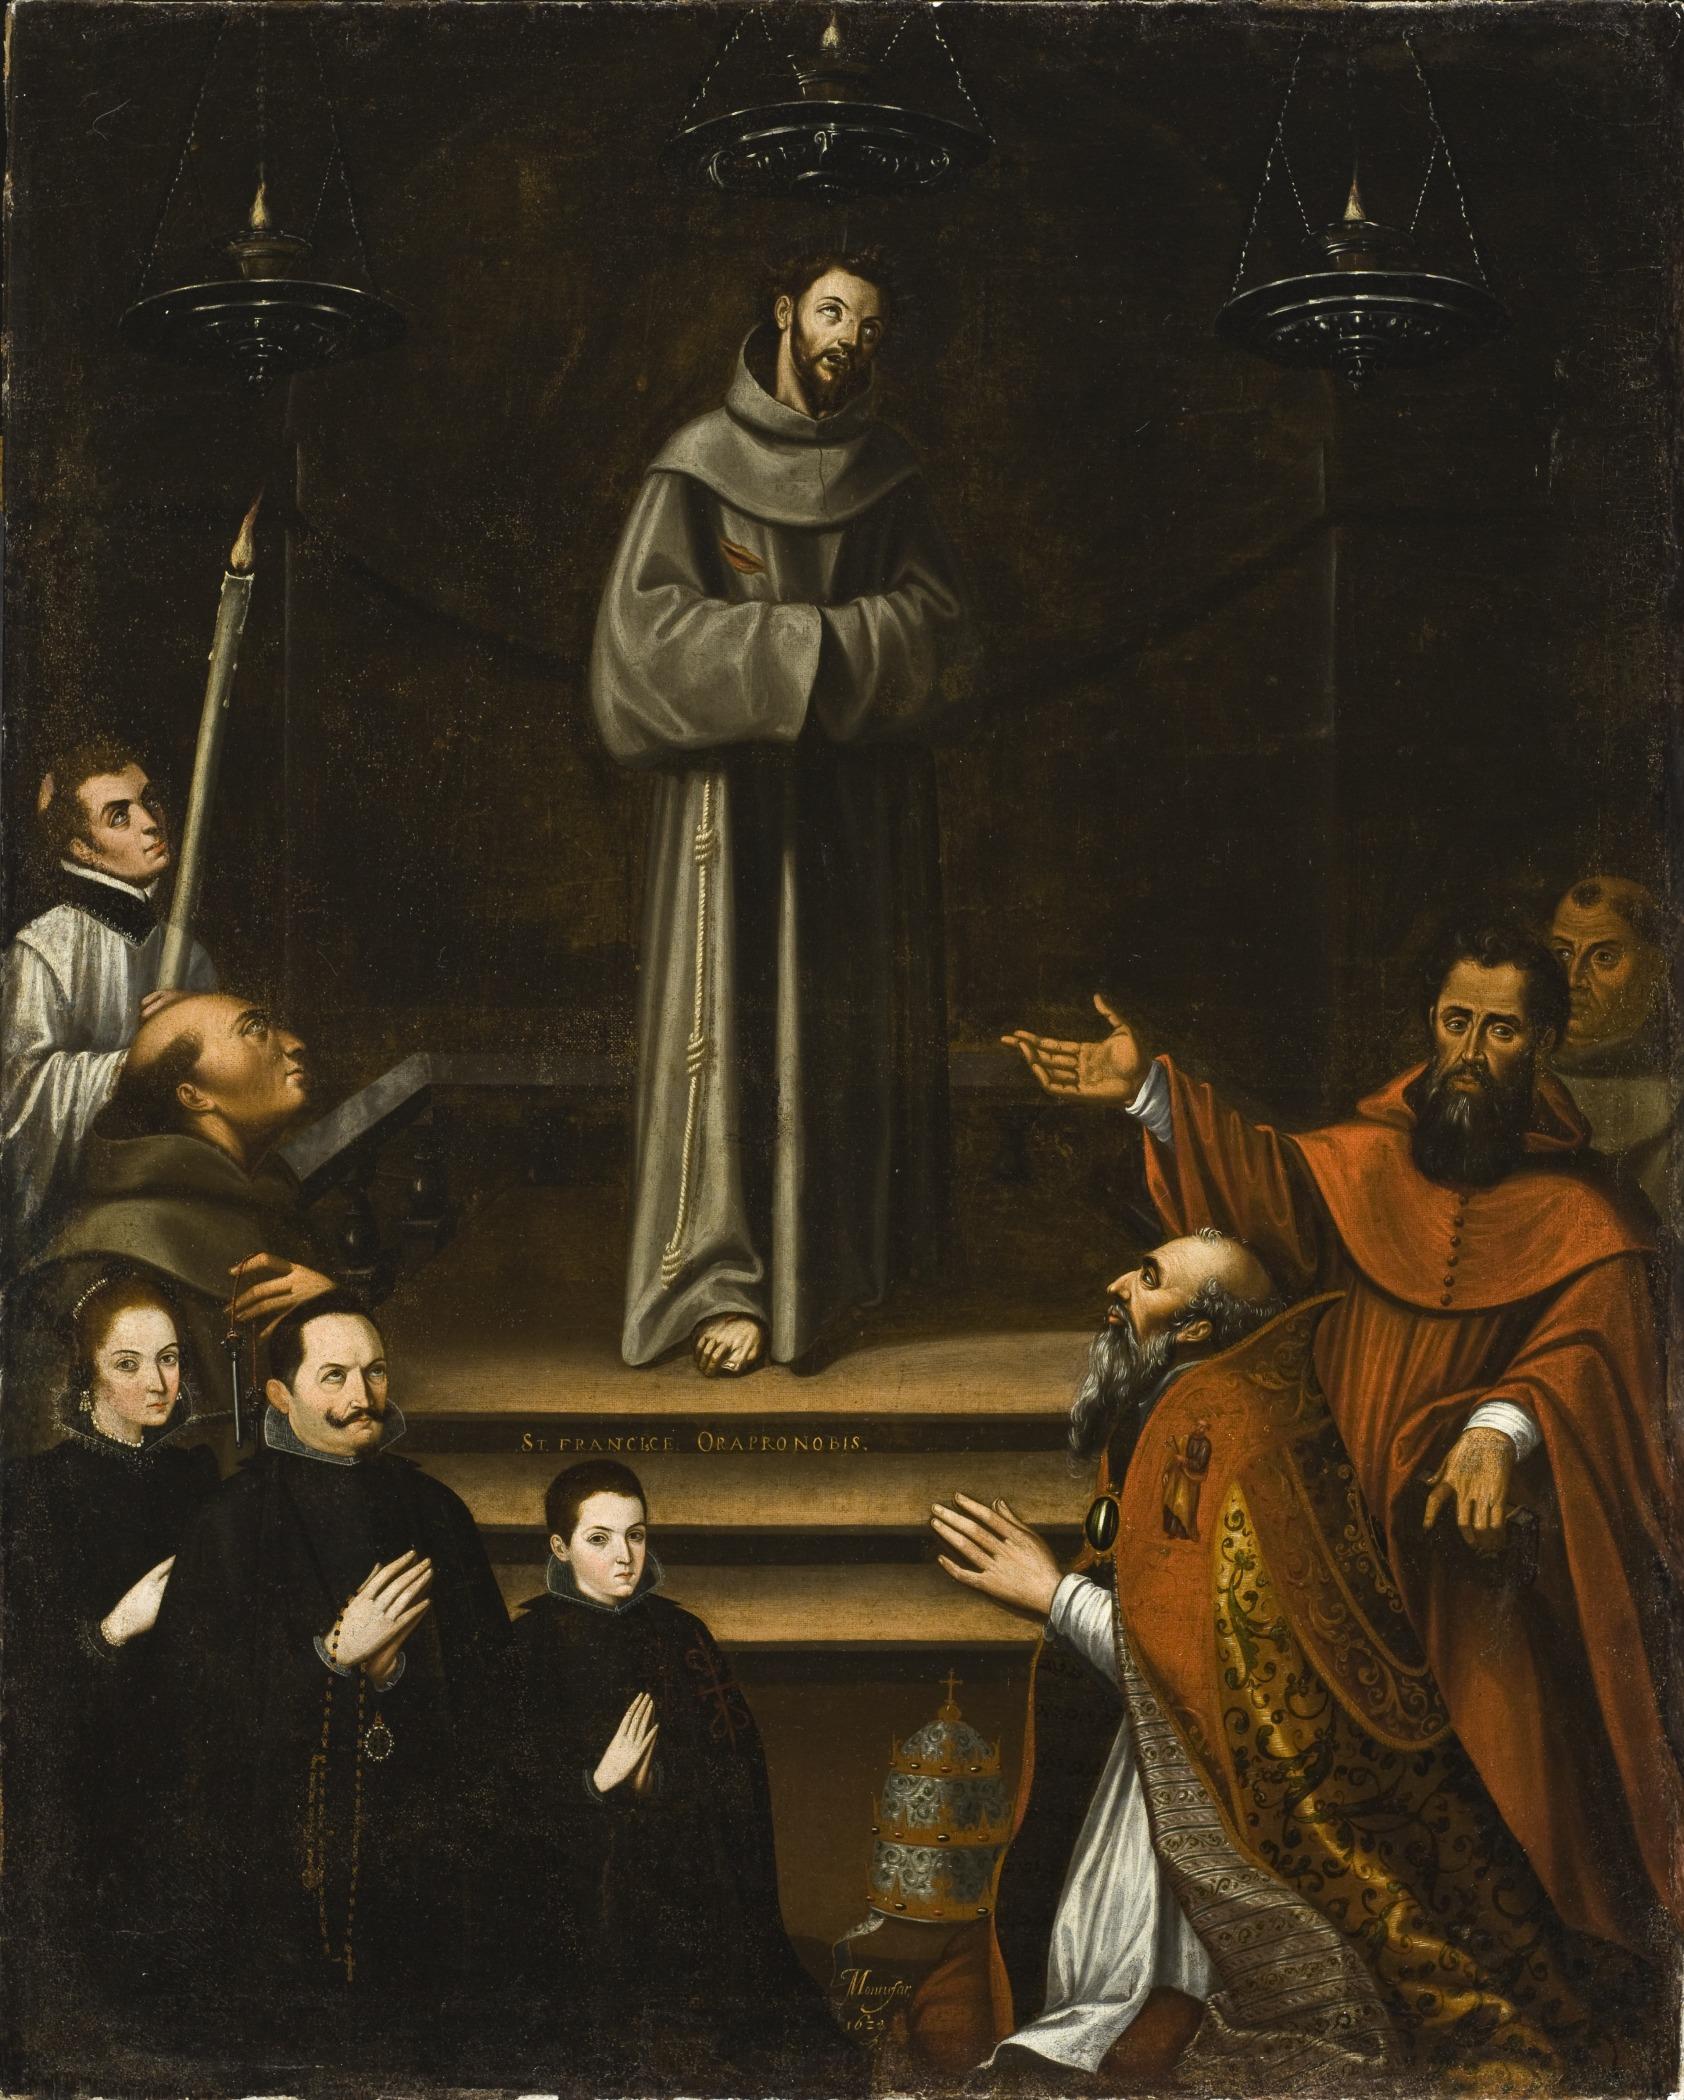 San francisco vs la dating